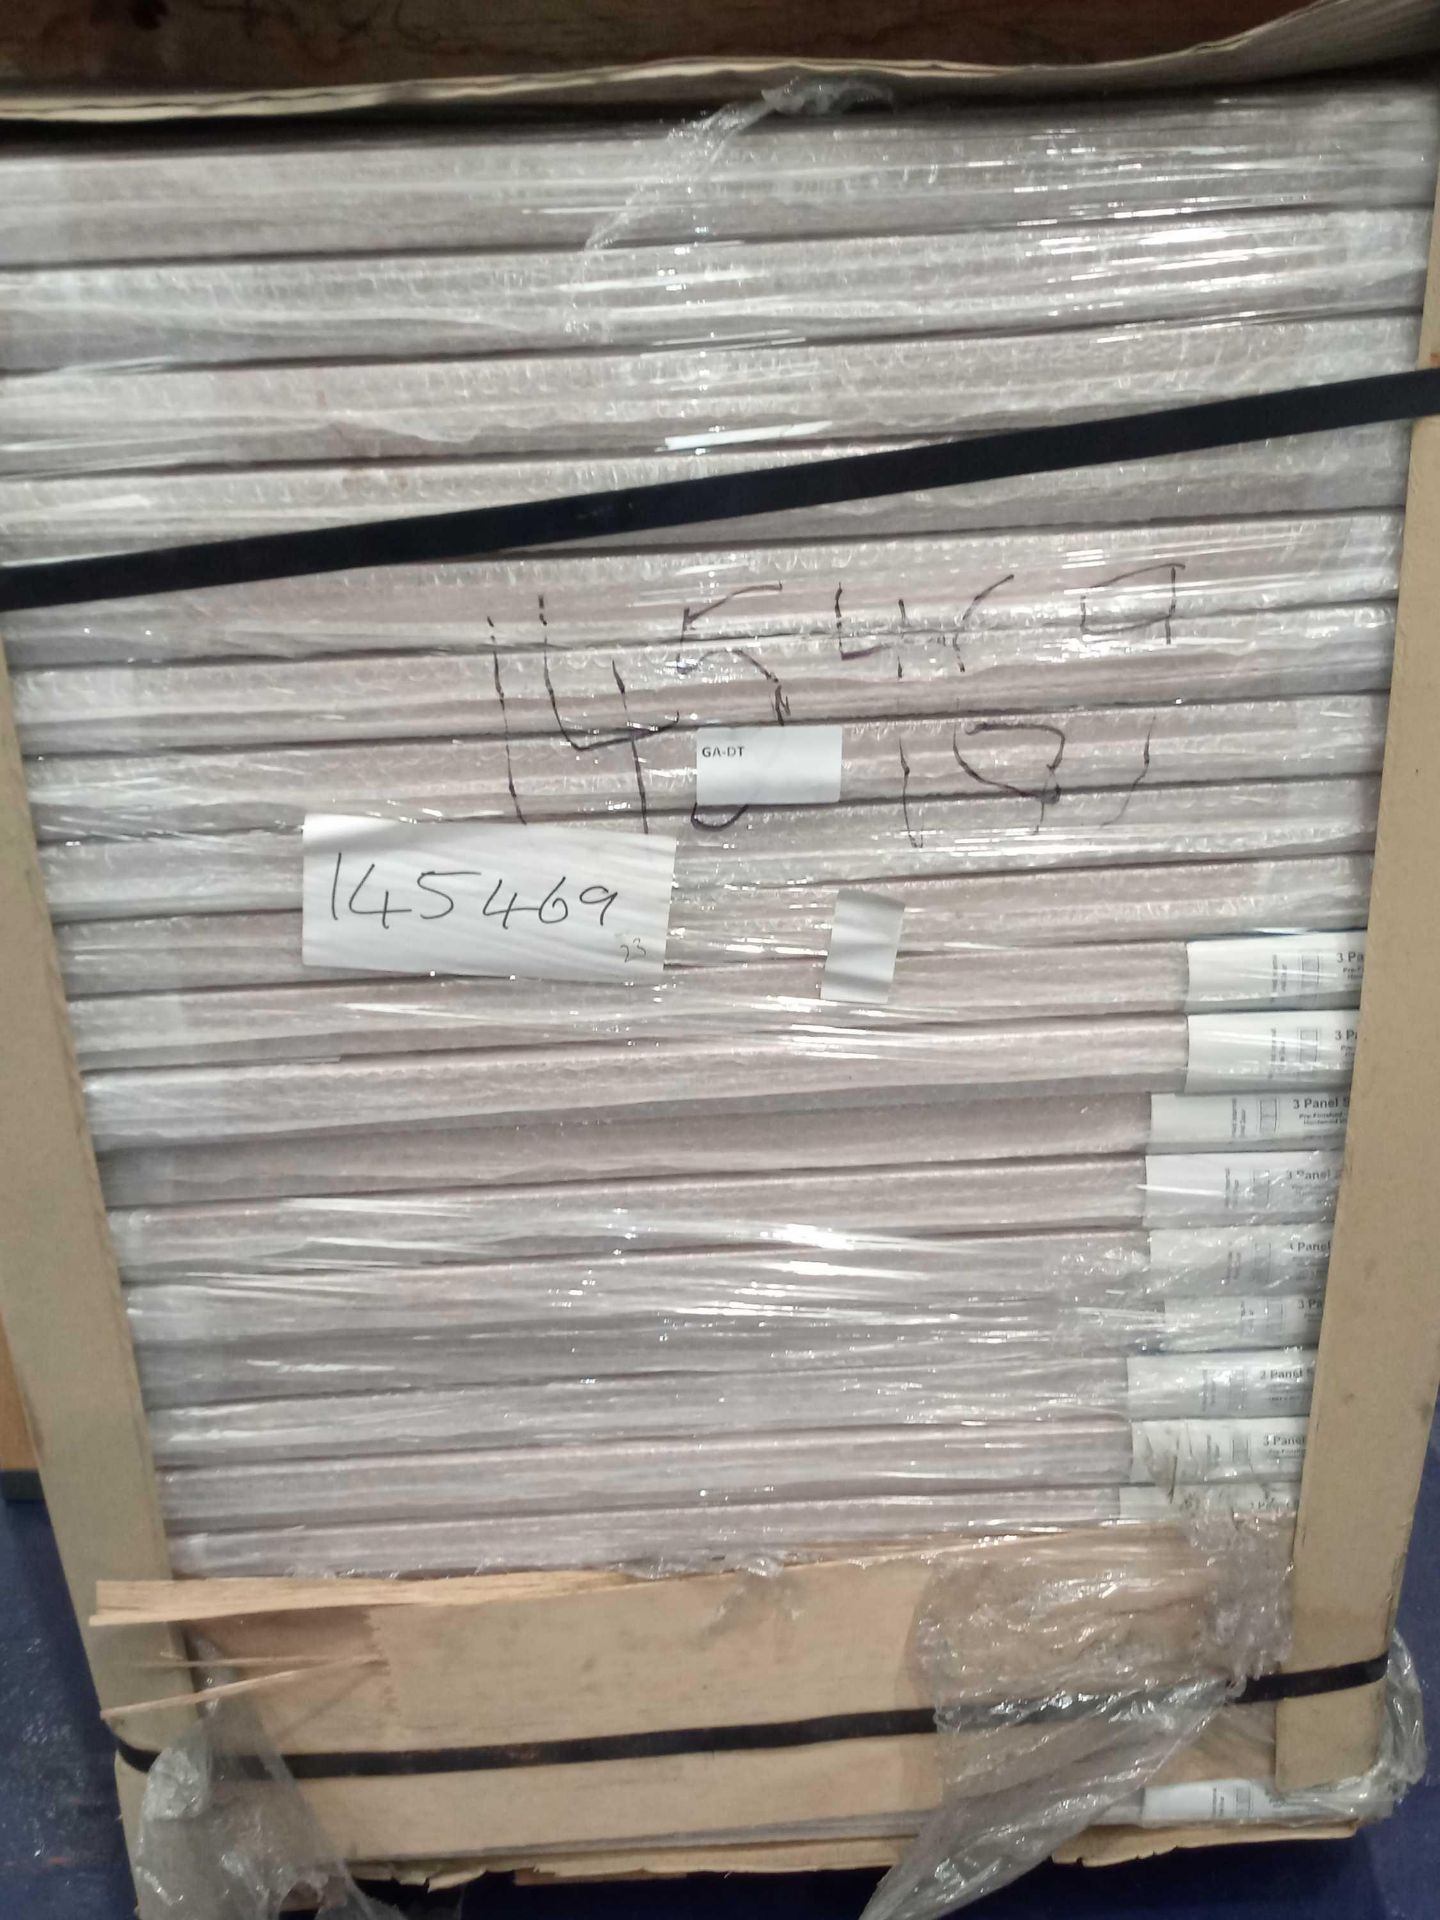 Rrp £4025 Brand New 3 Panel Solid Doors - Image 3 of 3